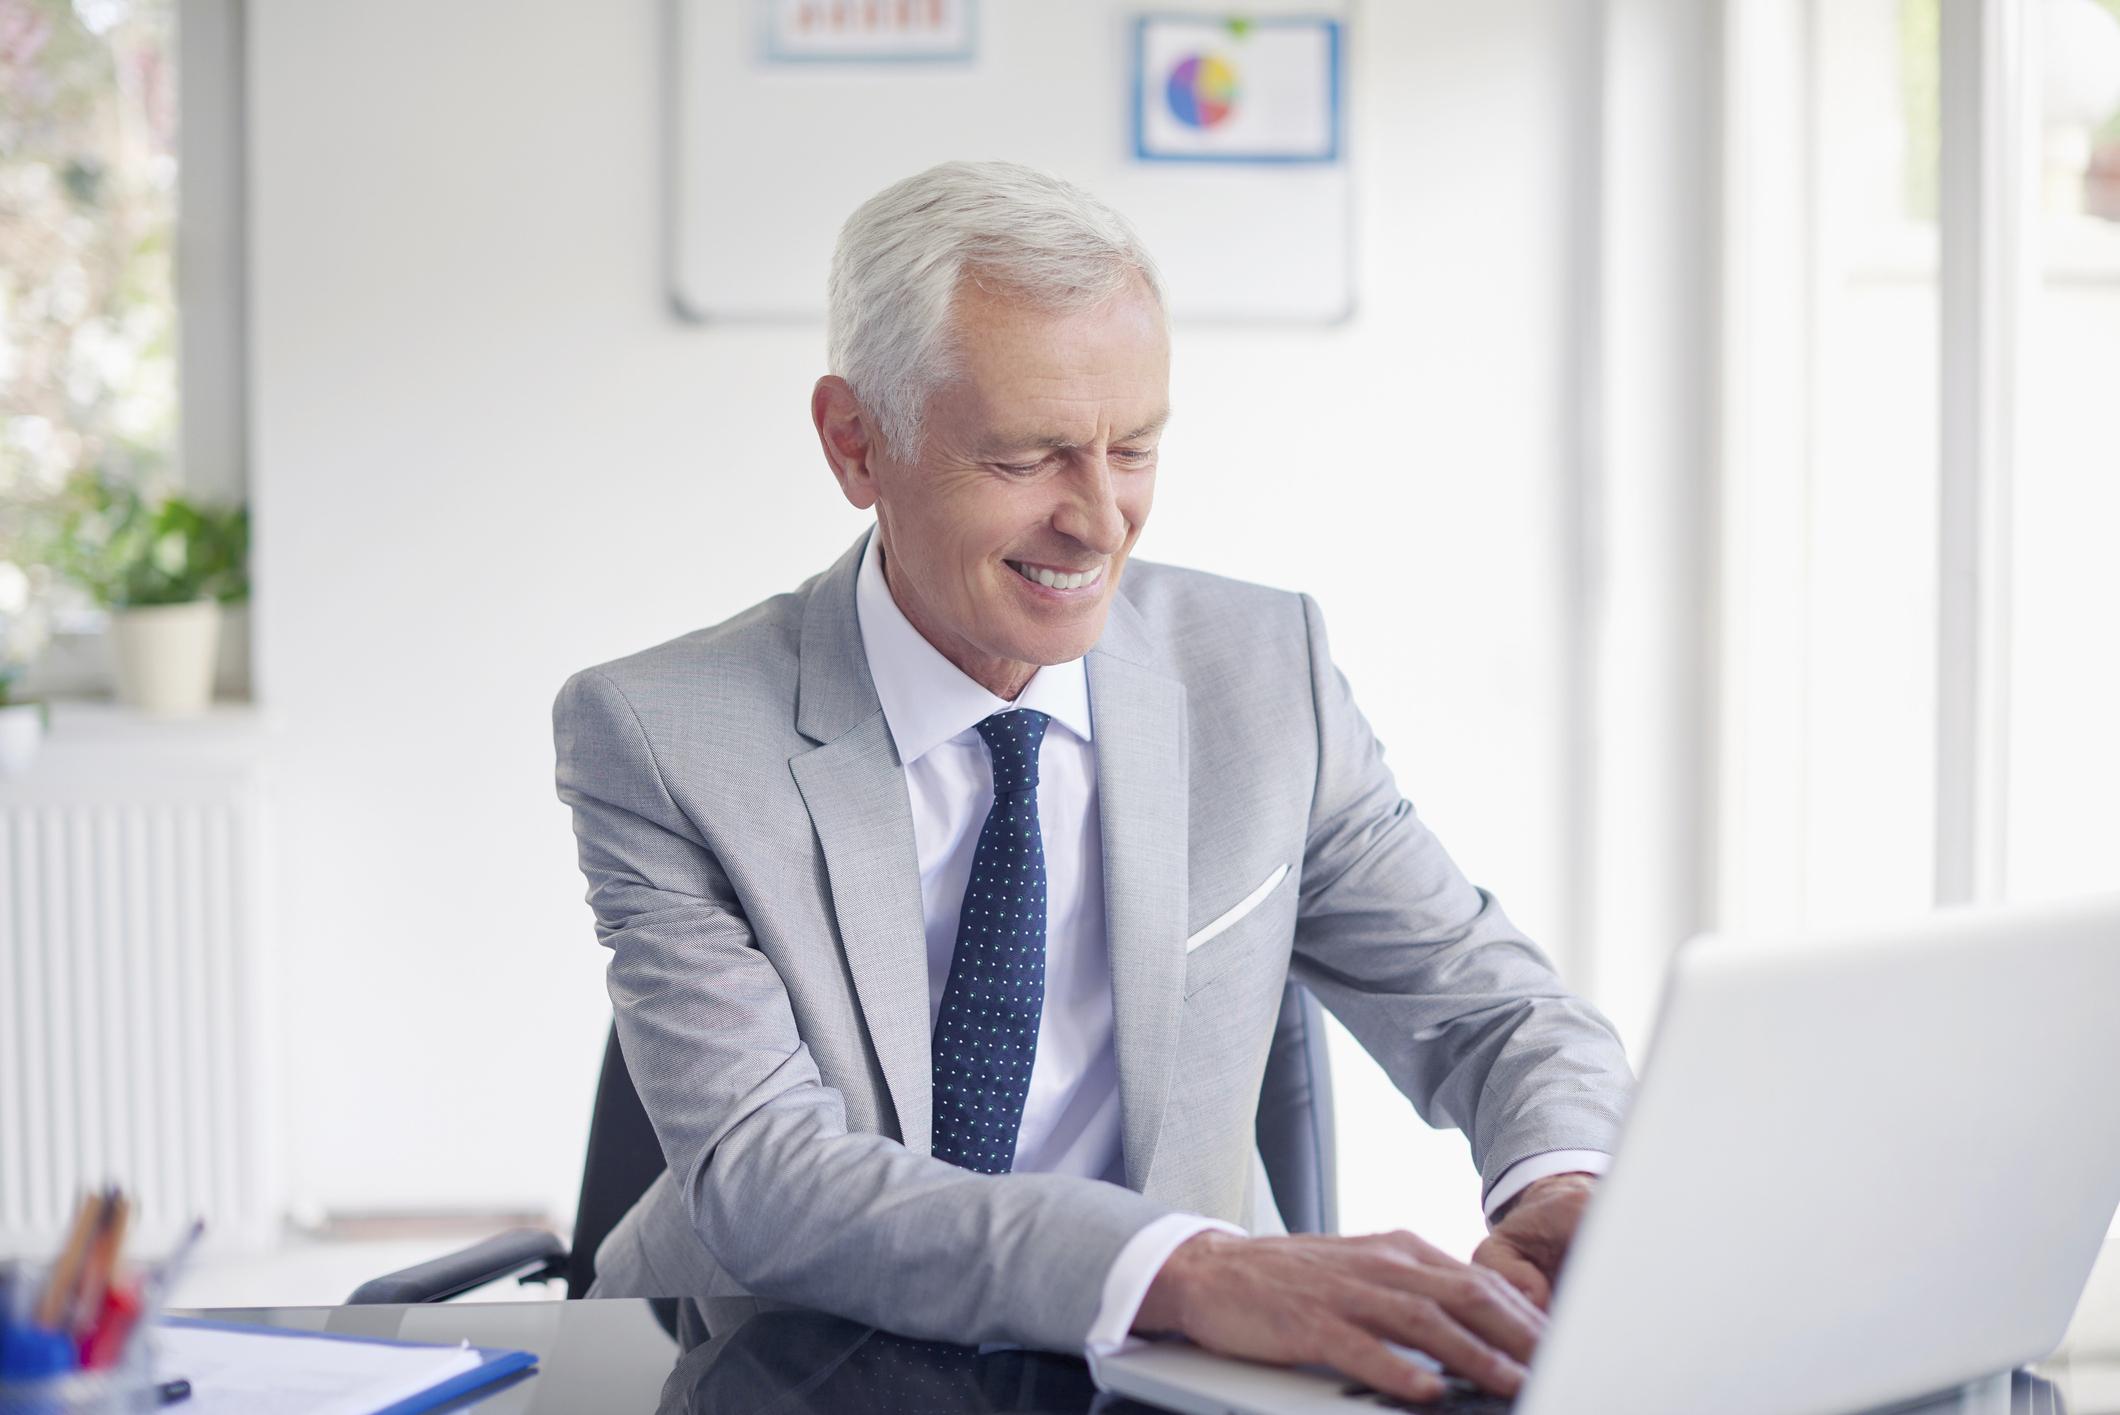 Financial advisor getting new client from webinar www.paladindigitalmarketing.com